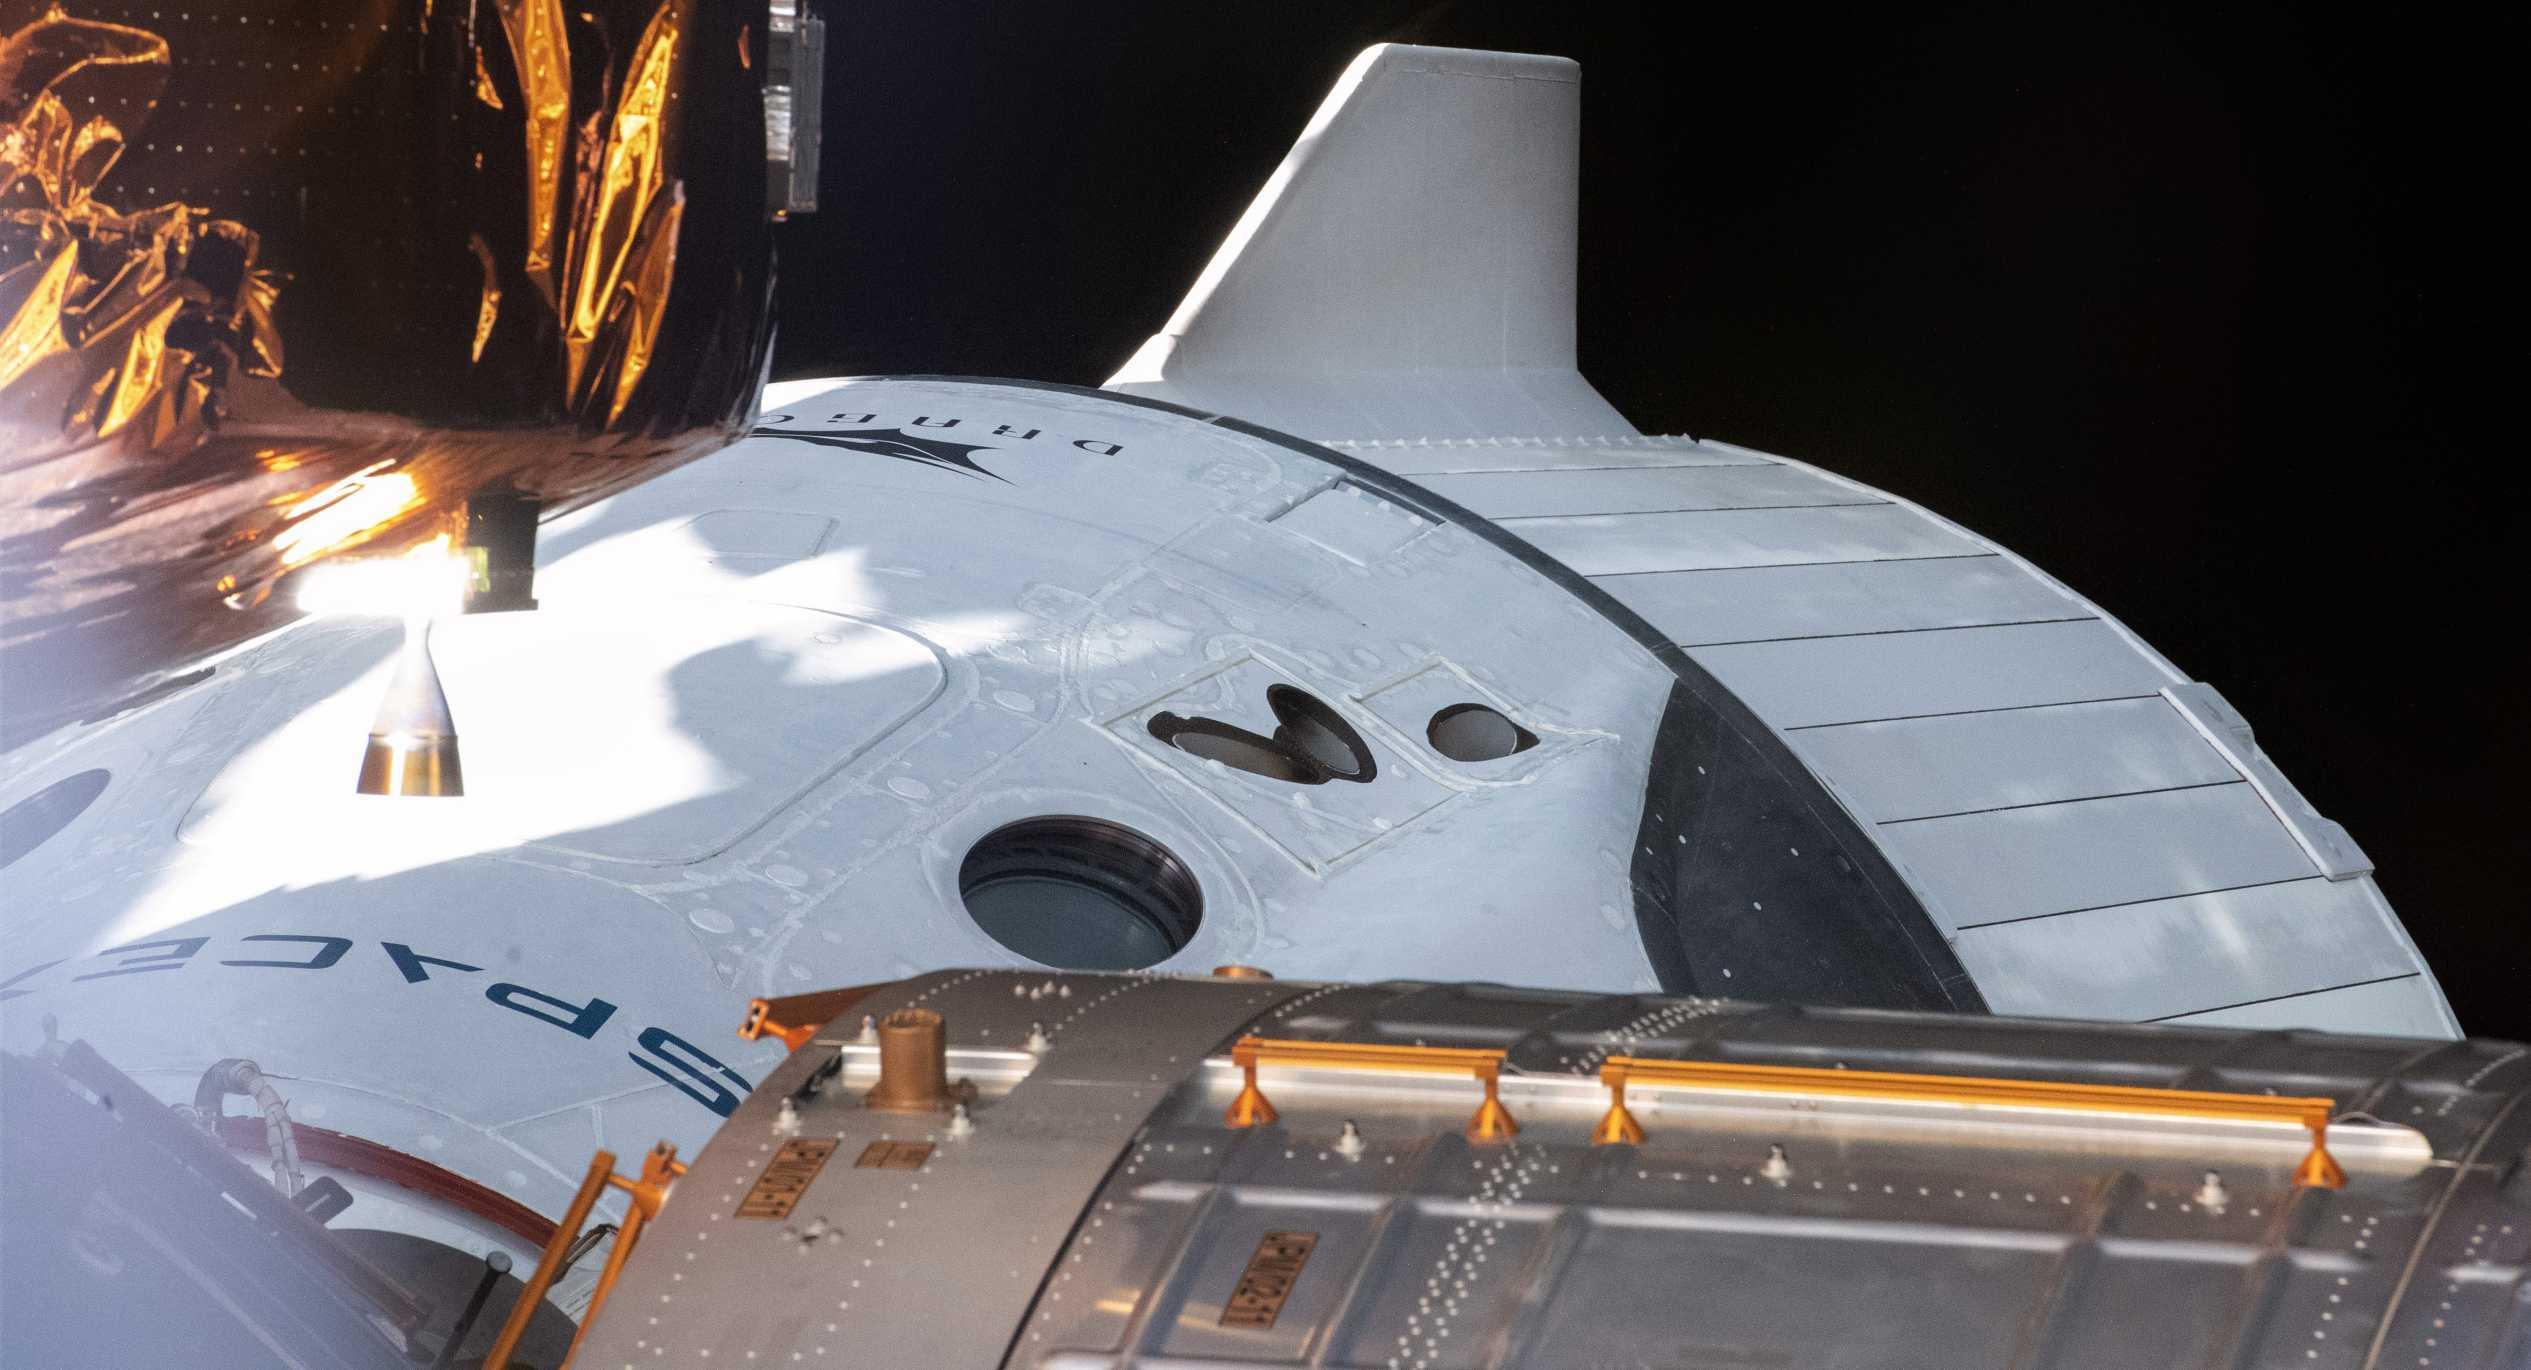 Crew Dragon C206 Demo-2 ISS 060820 (NASA) 1 crop 2 (c)